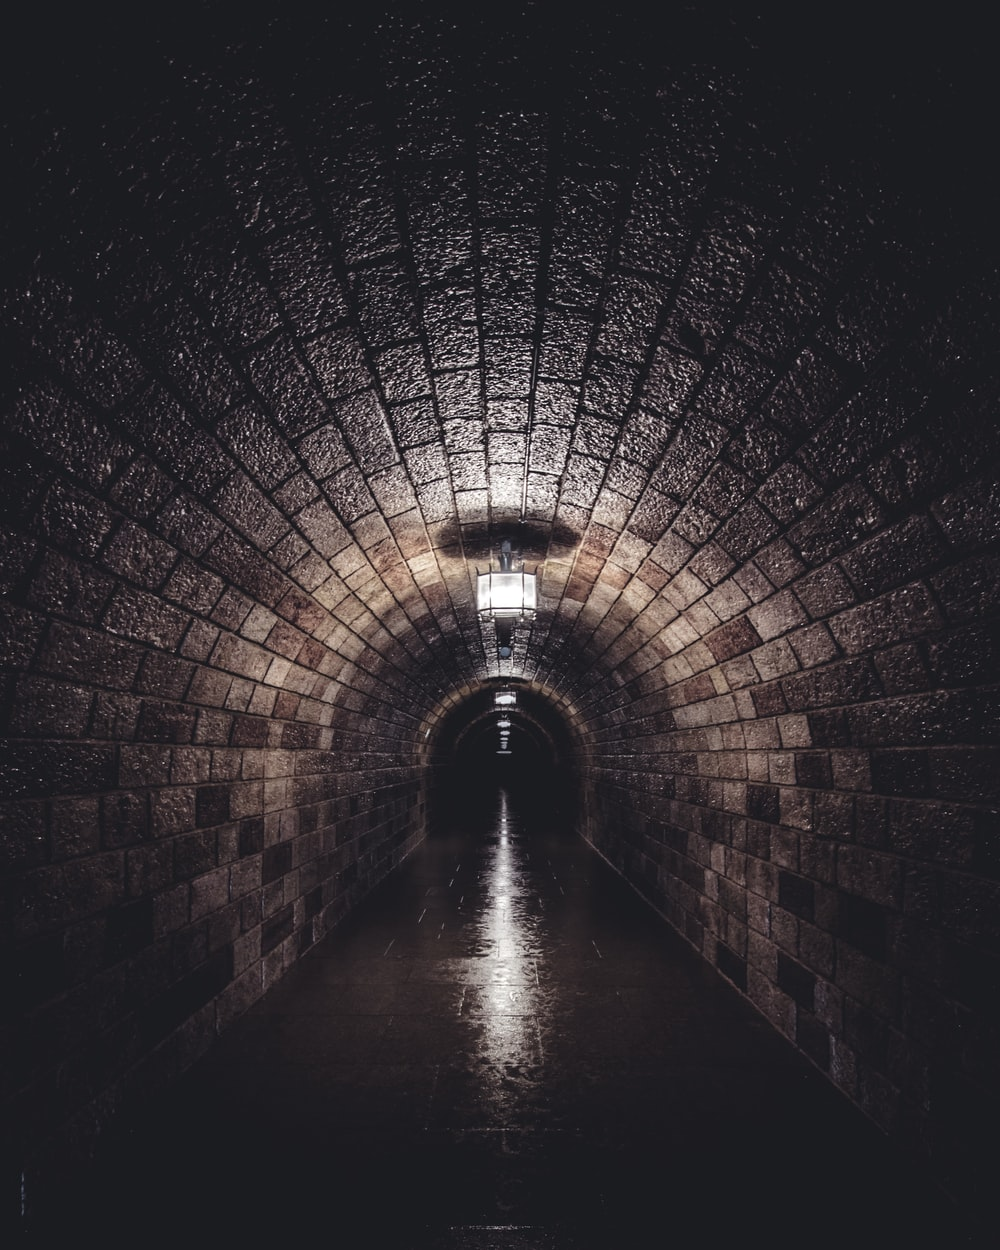 brown empty hallway